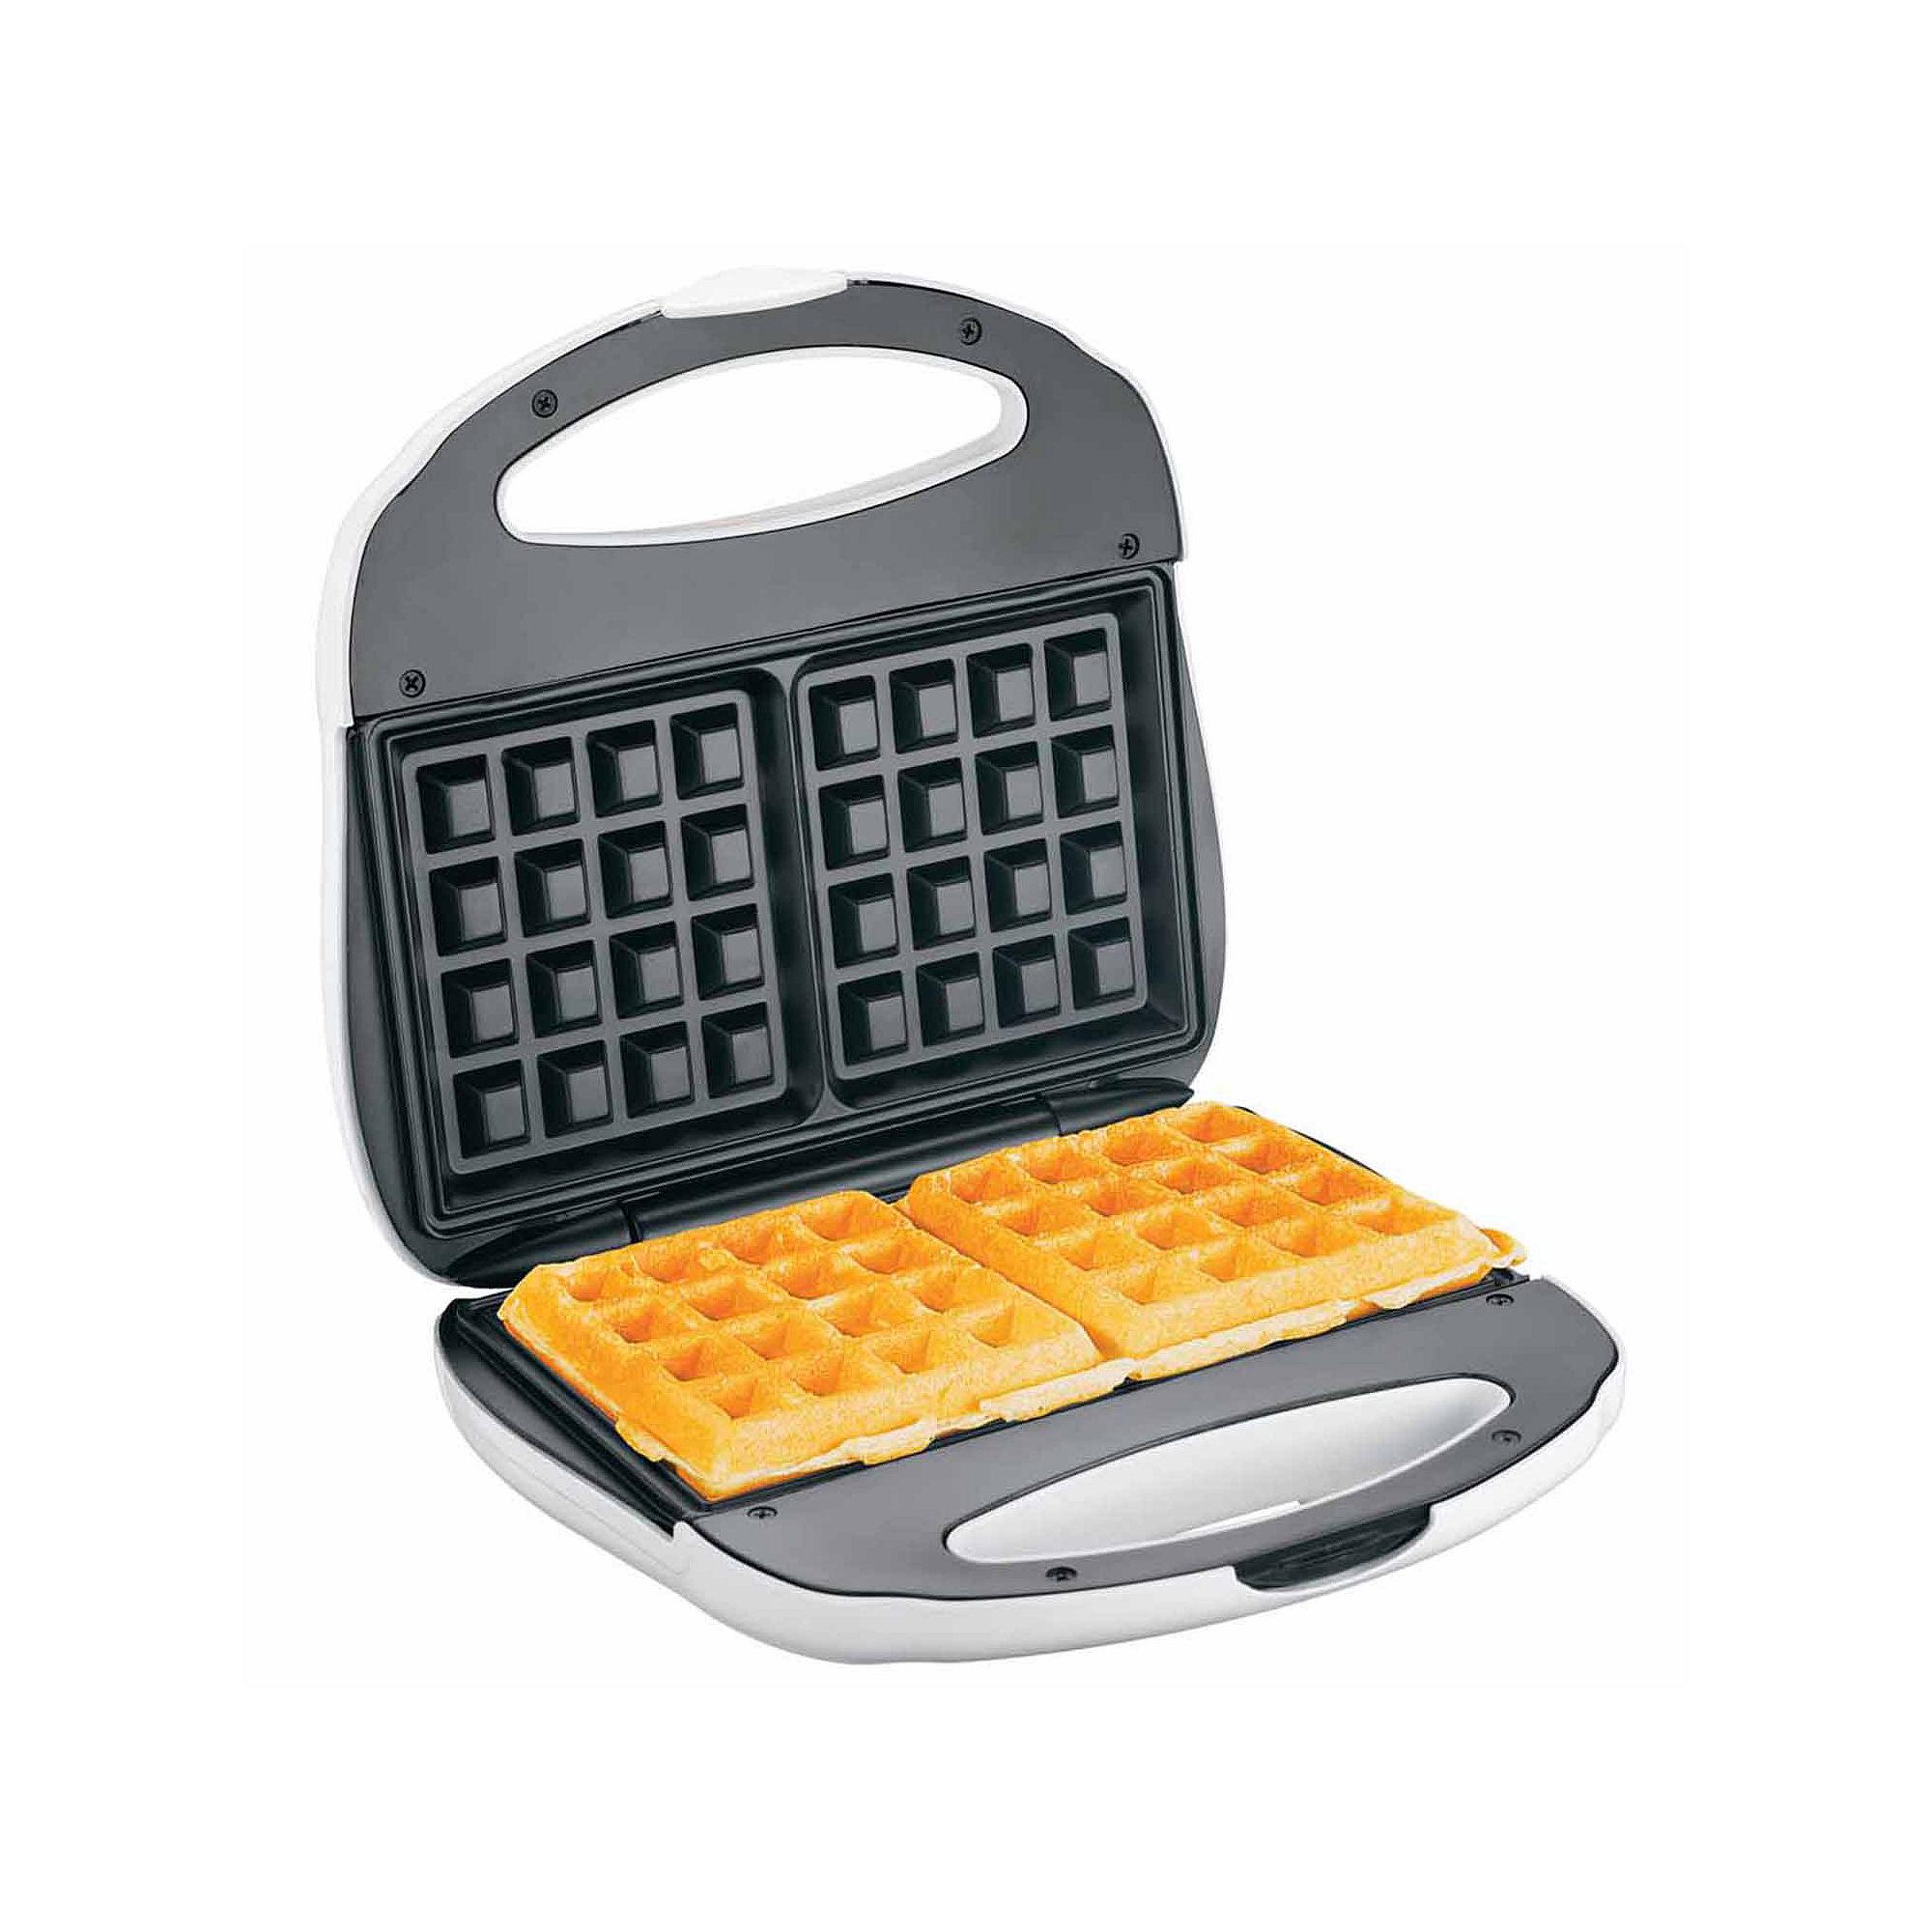 Proctor Silex Belgian Style Waffle Maker